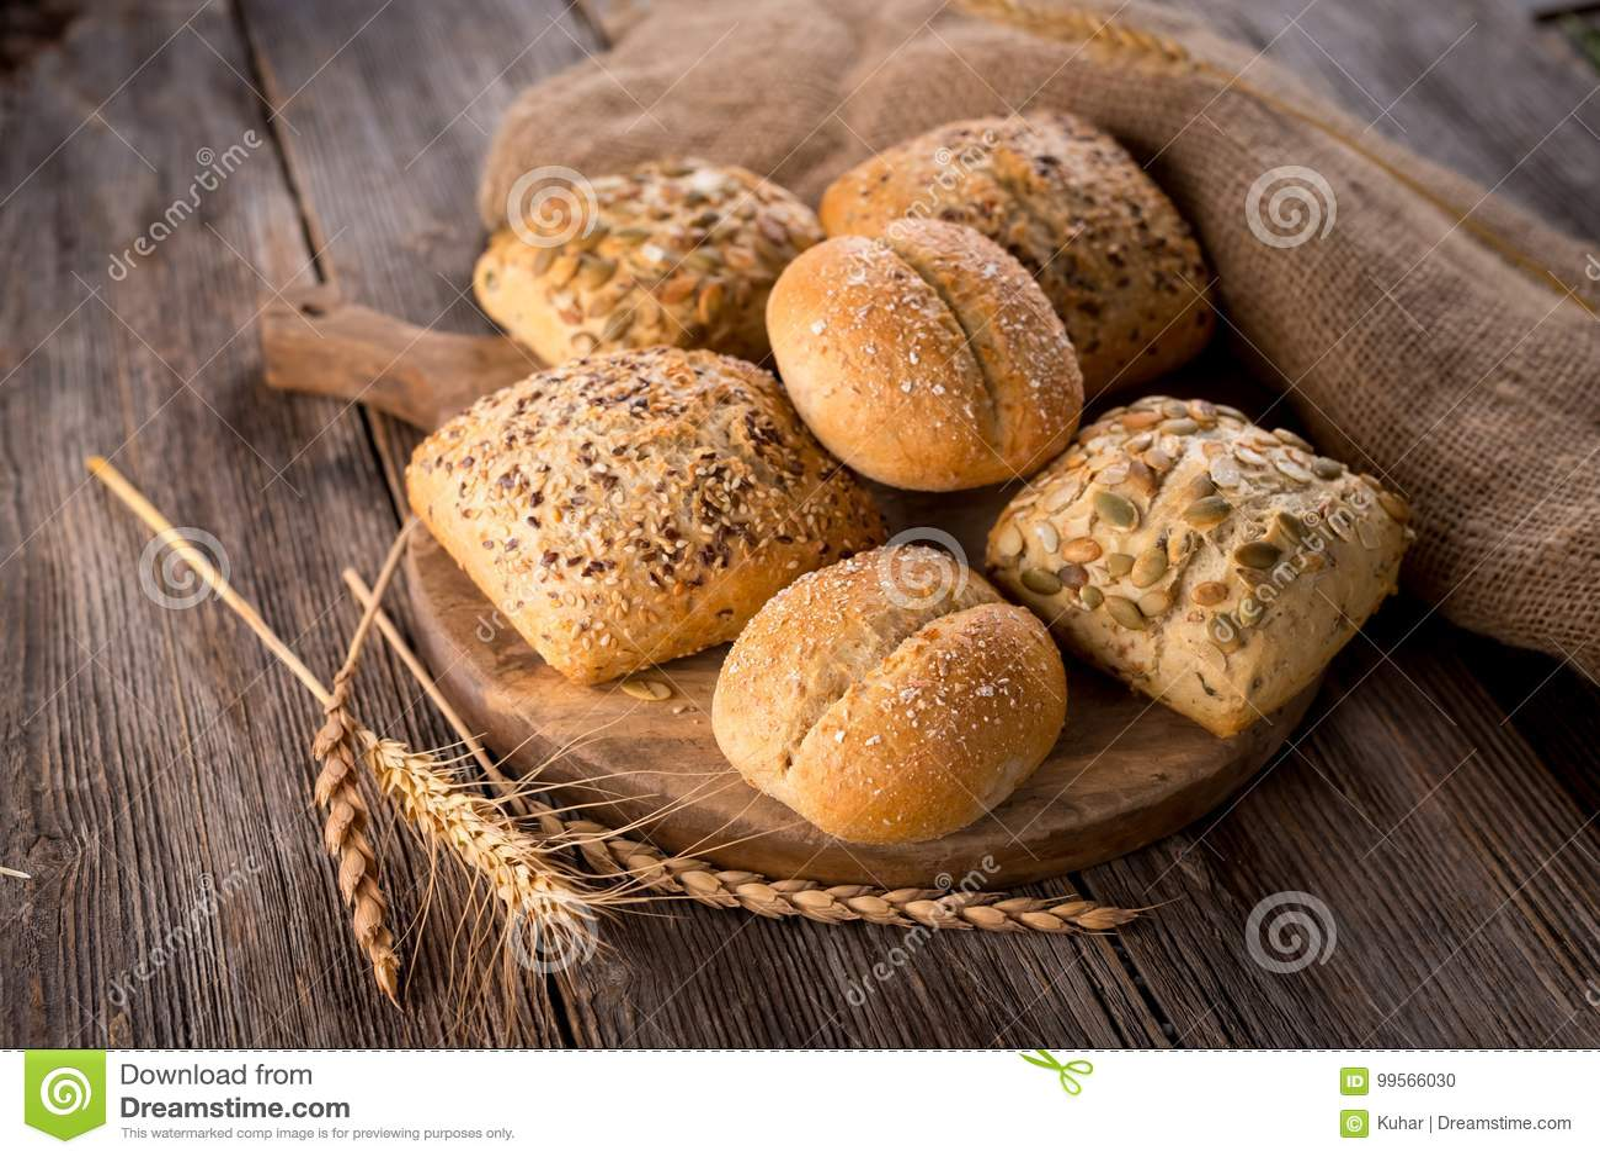 Varios tipos de pan